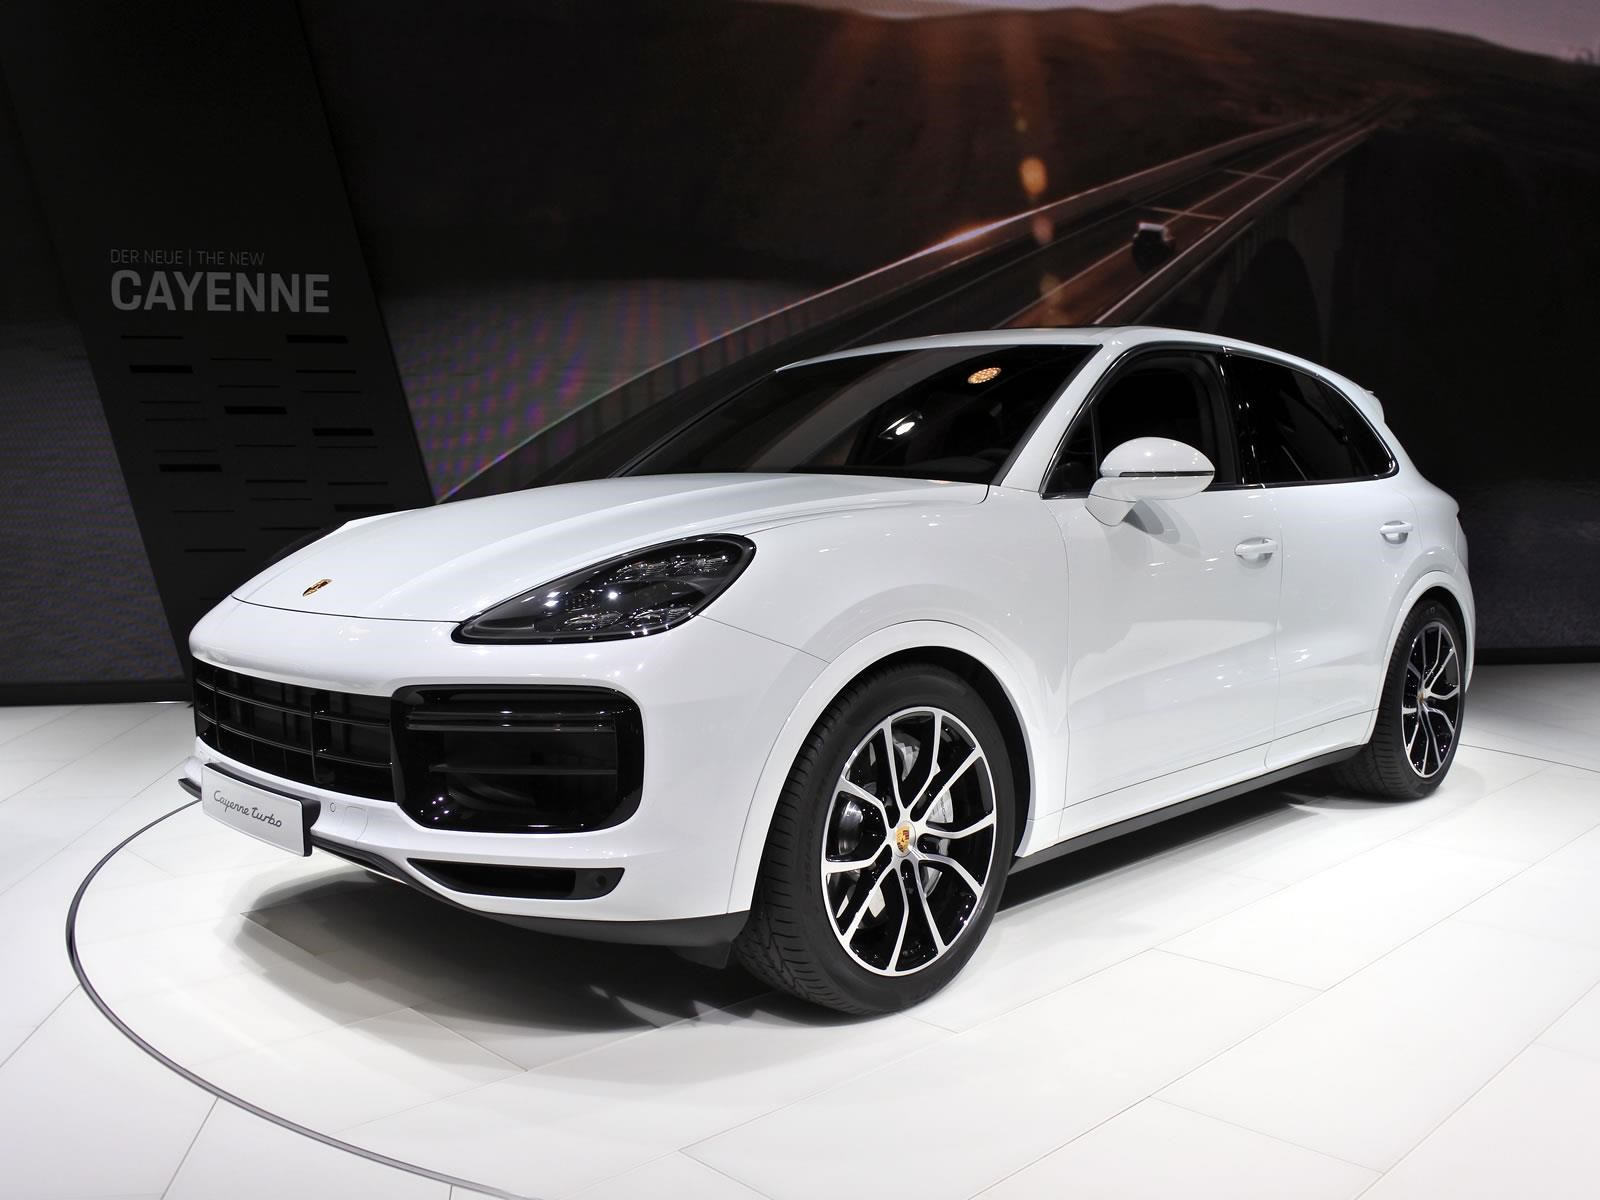 Porsche Cayenne Turbo 2019 se presenta